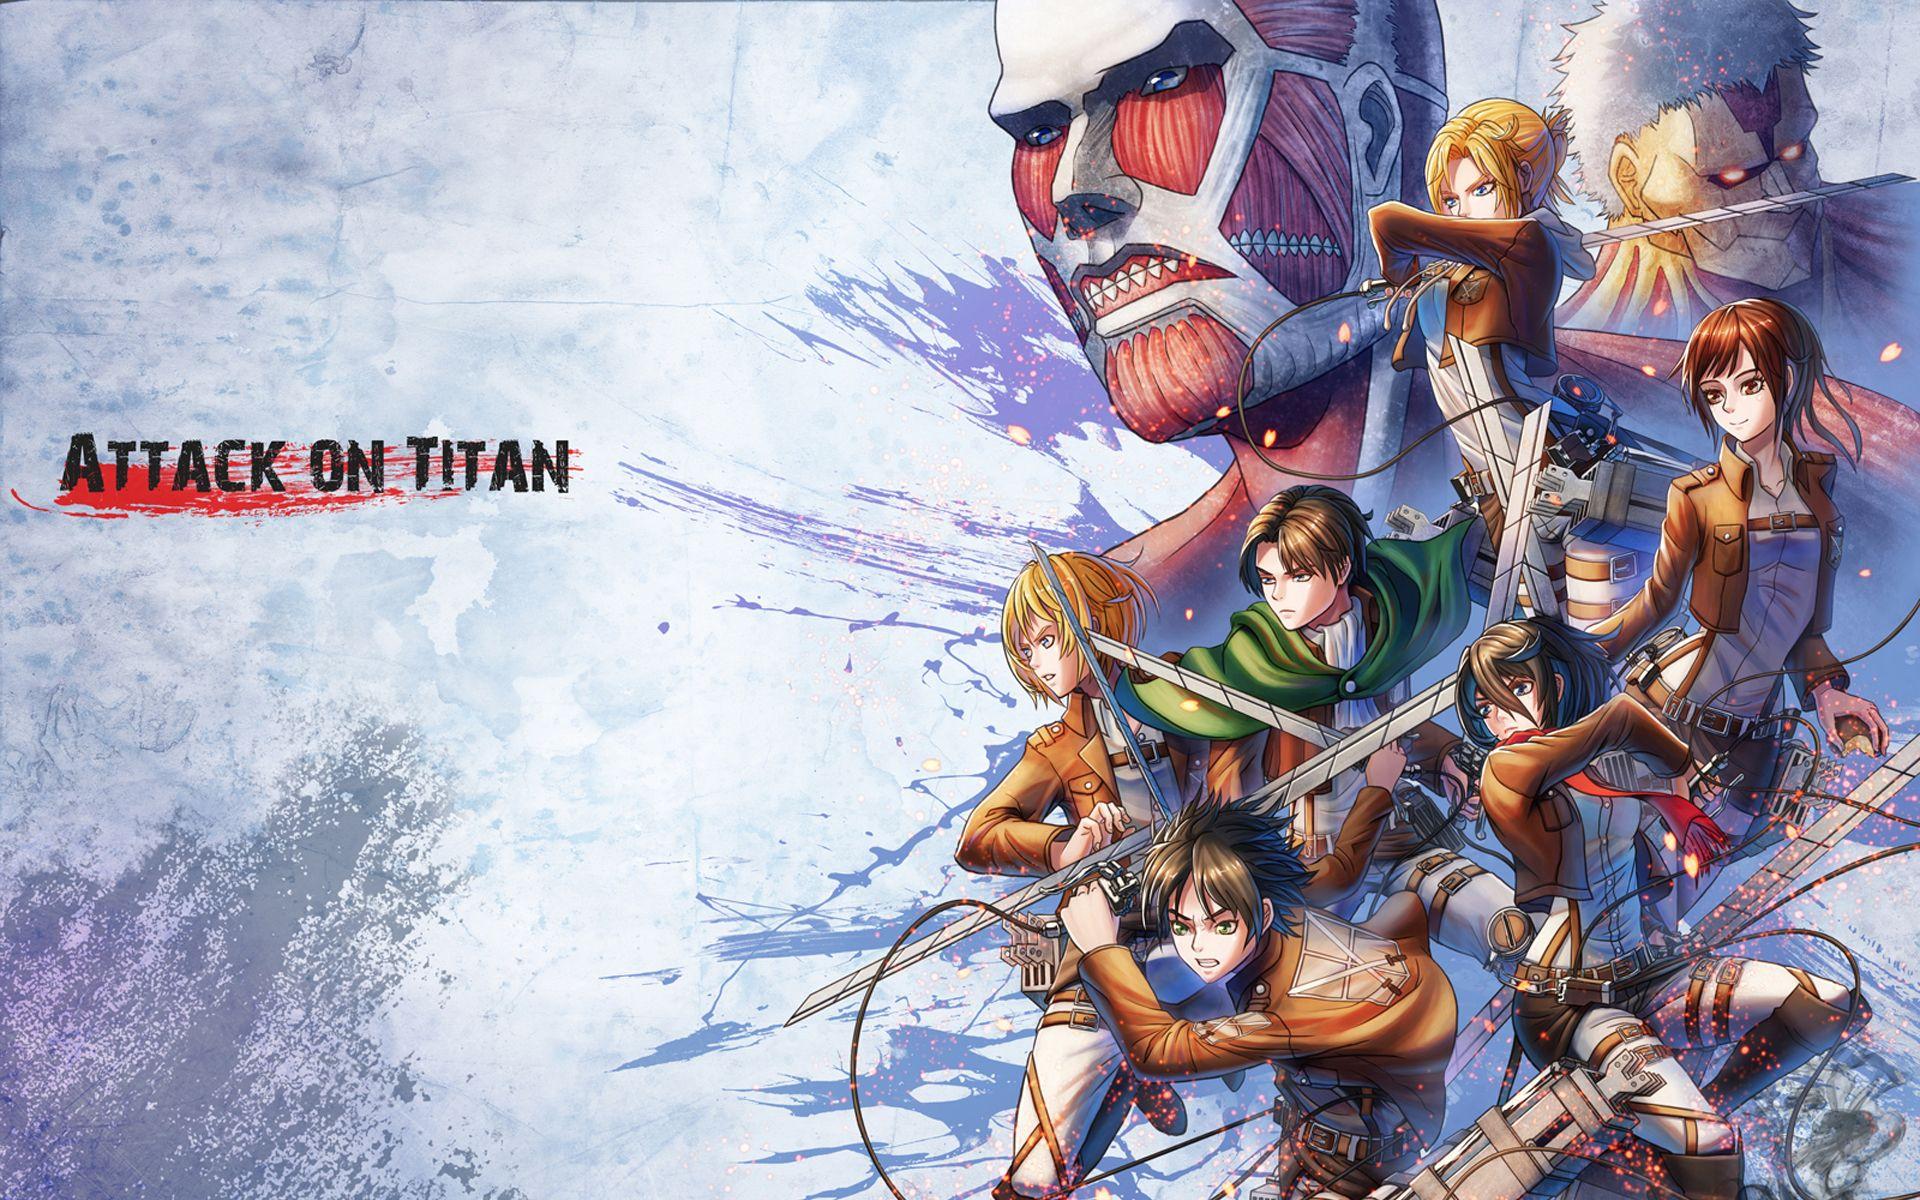 Levi Eren Mikasa Armin Sasha Annie The Colossal And Armored Titan 1920x1200 Wallpaper Attack On Titan Art Attack On Titan Anime